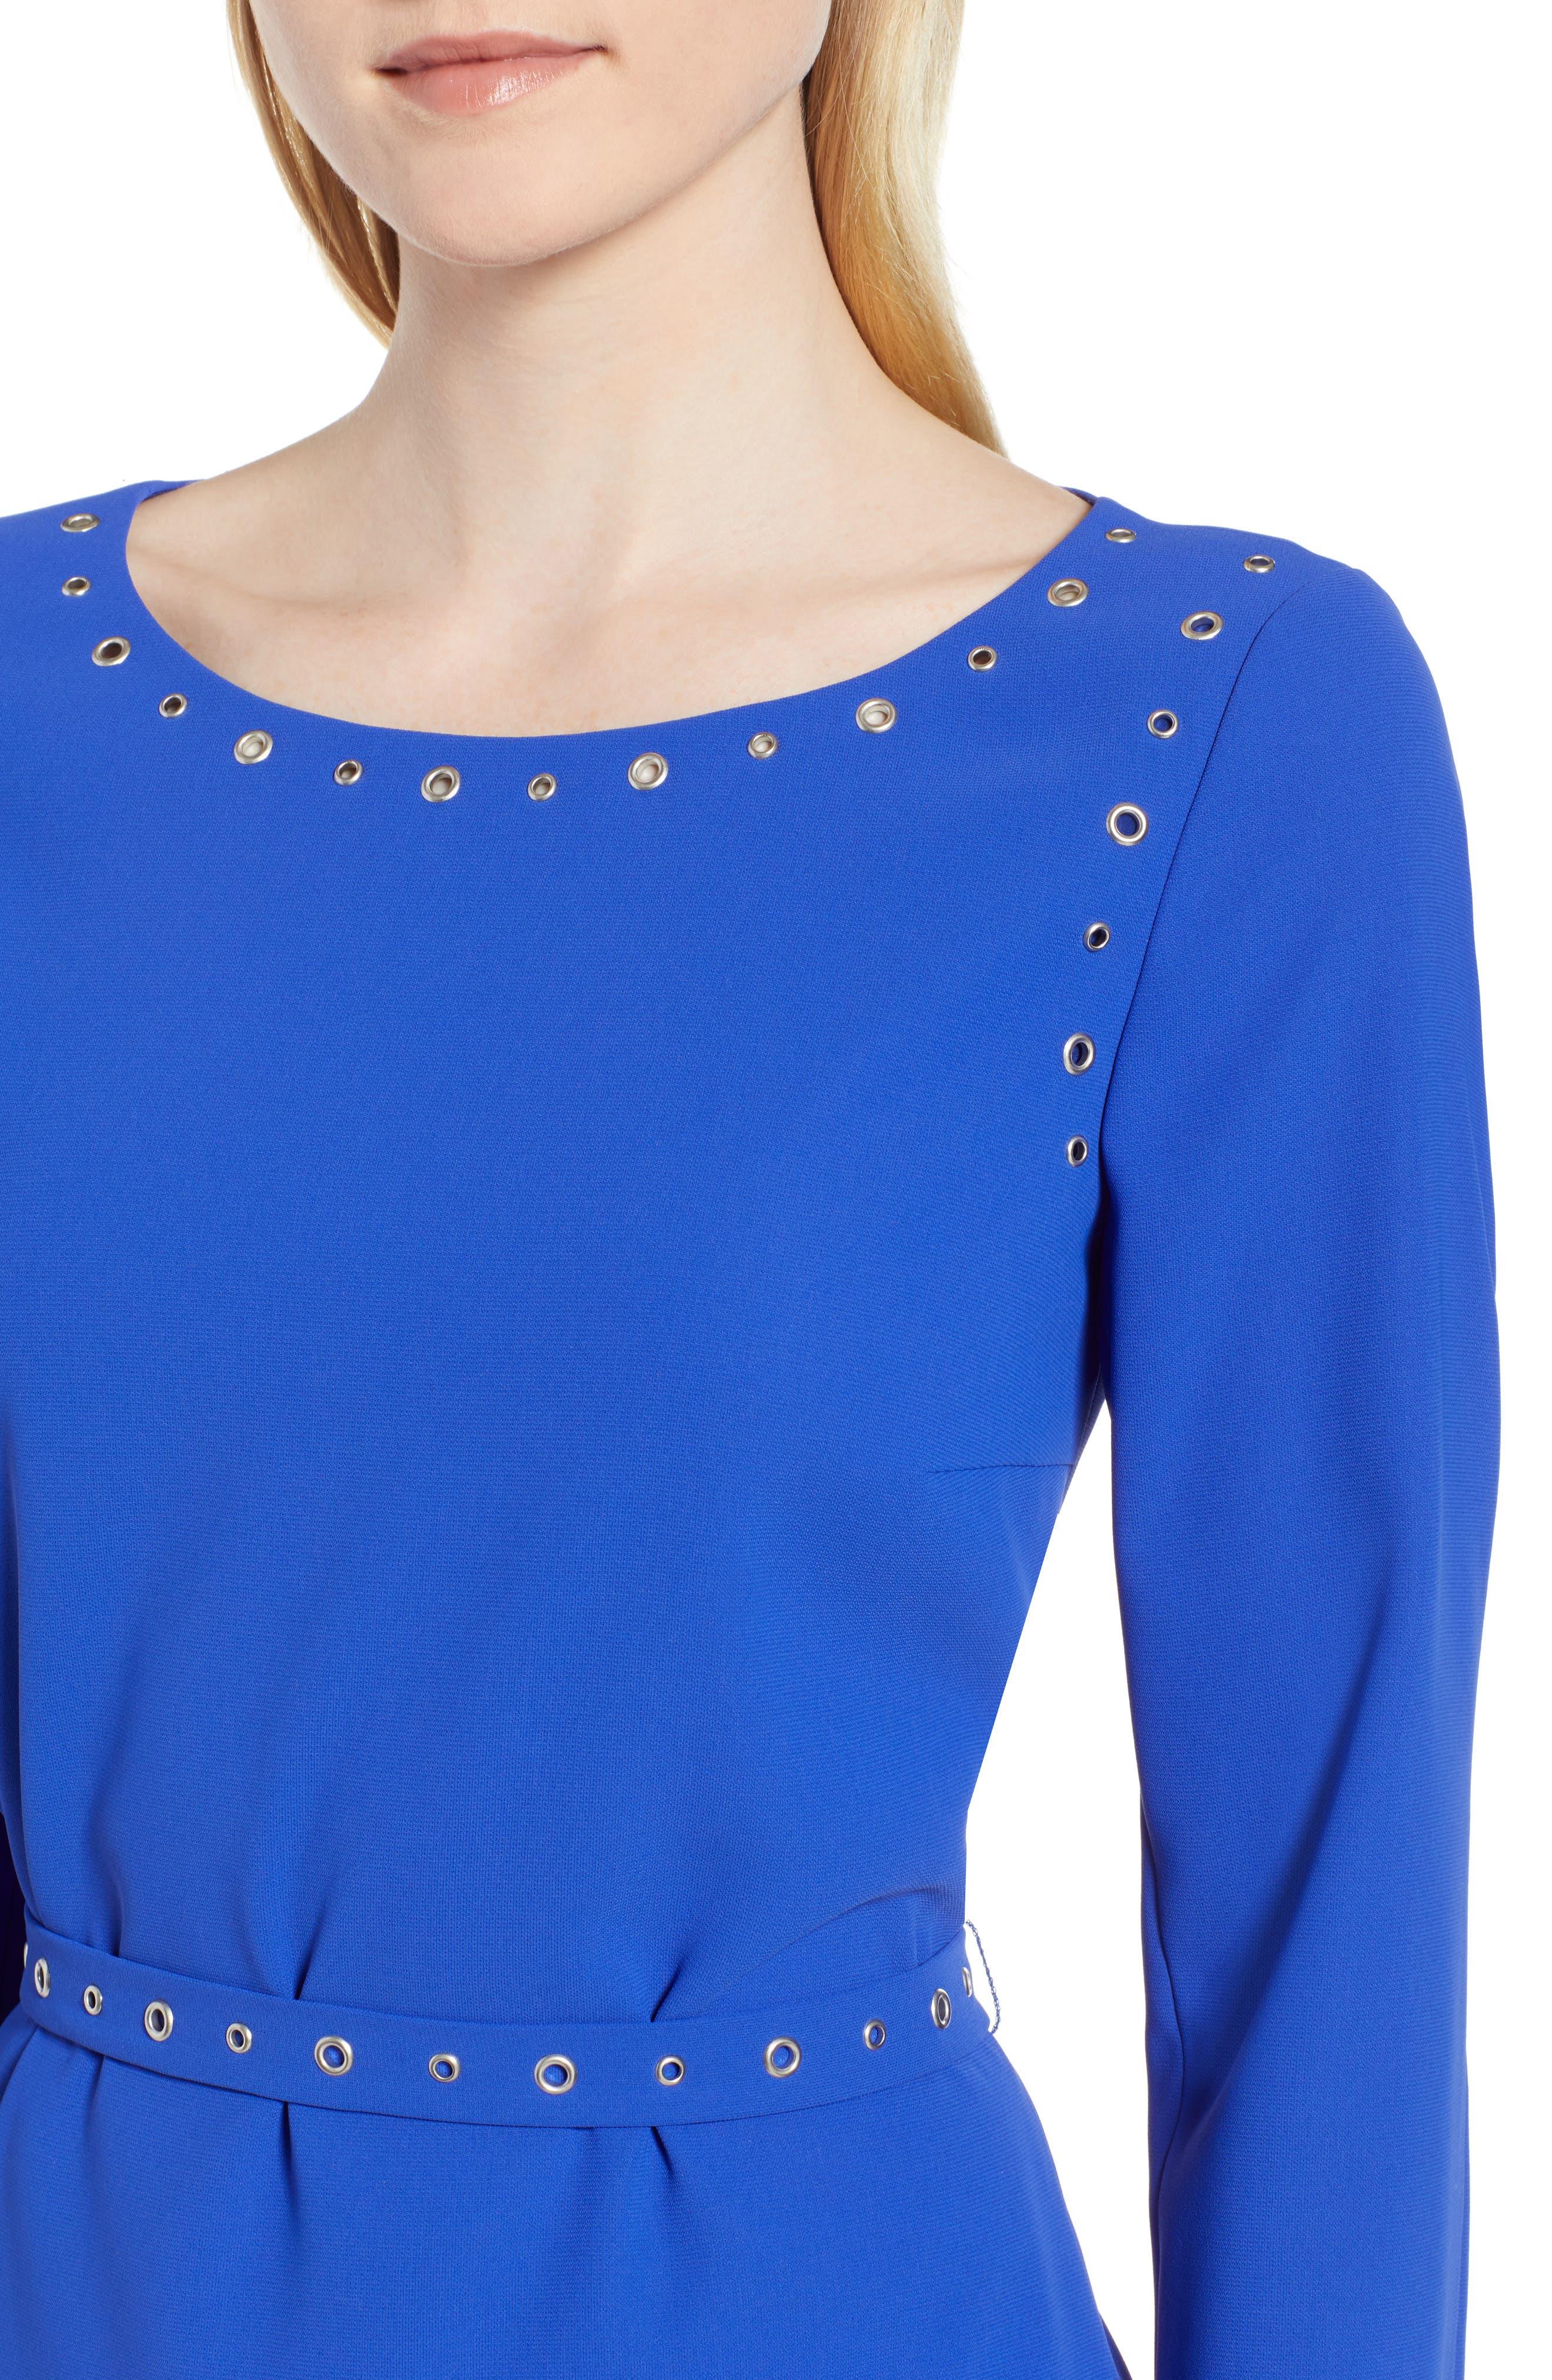 Henryke Rivet Crepe Dress,                             Alternate thumbnail 4, color,                             SAILOR BLUE